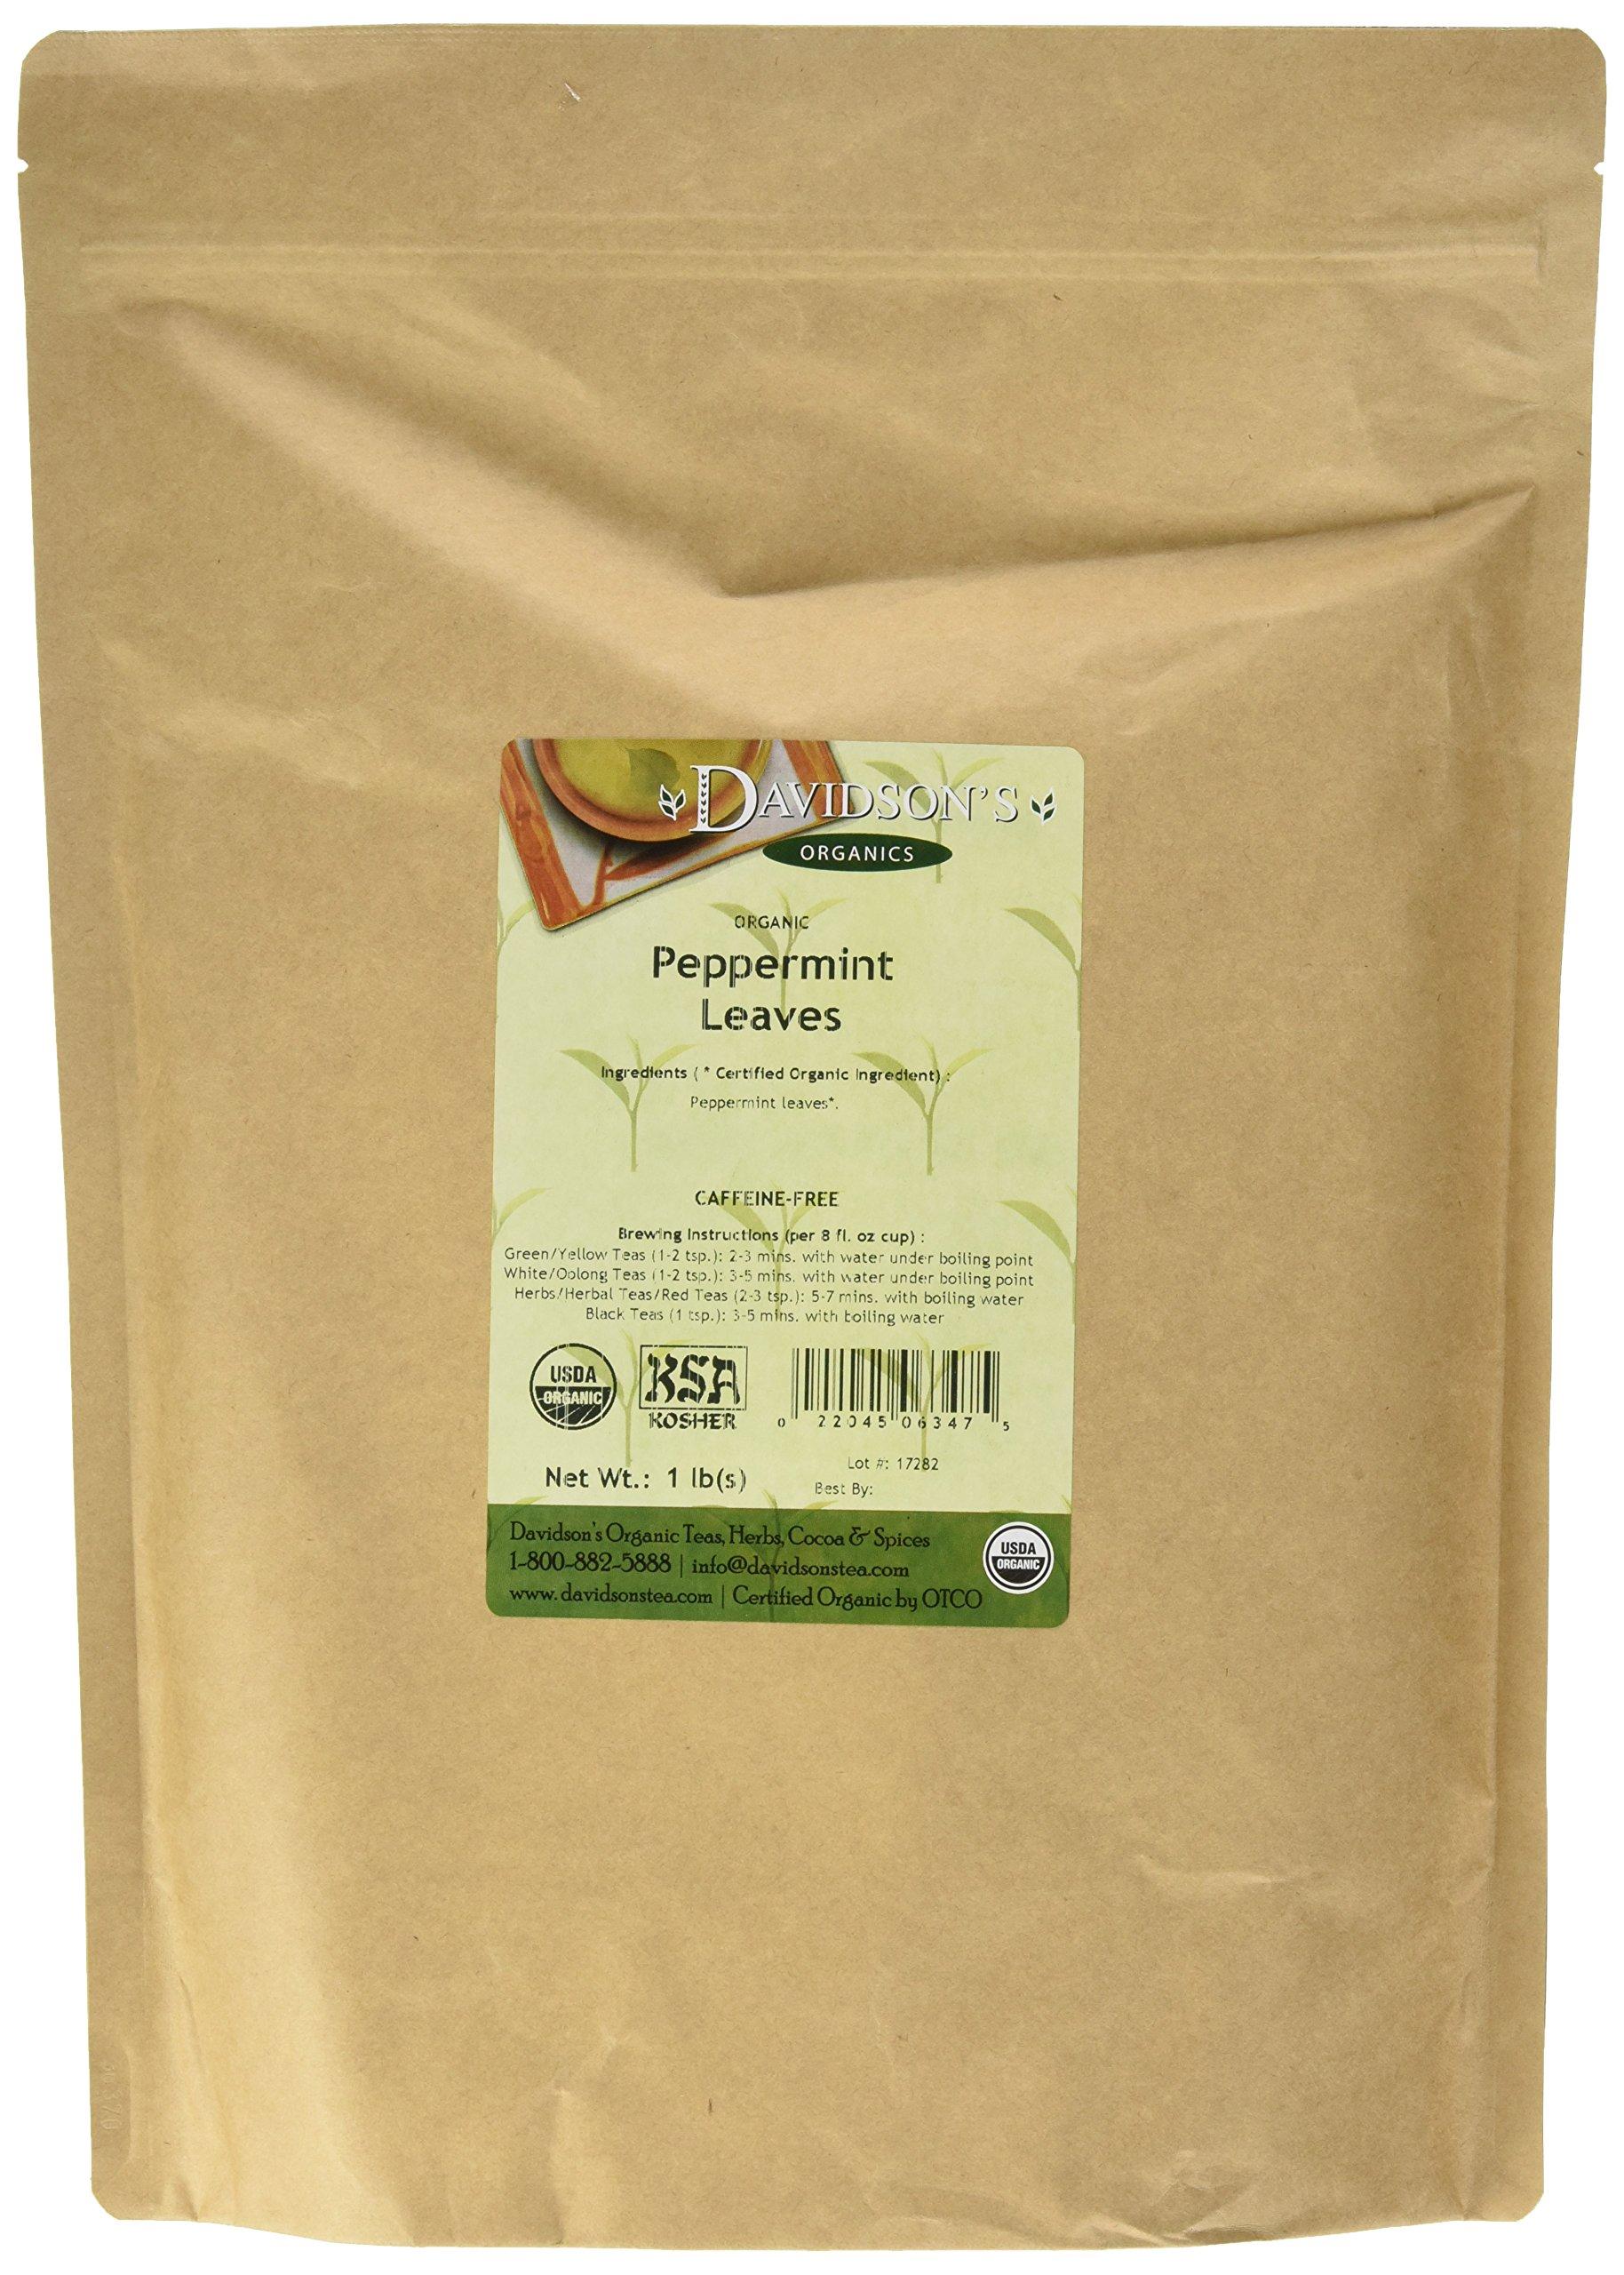 Davidson's Tea Bulk, Organic Peppermint Leaves, 16-Ounce Bag by Davidson's